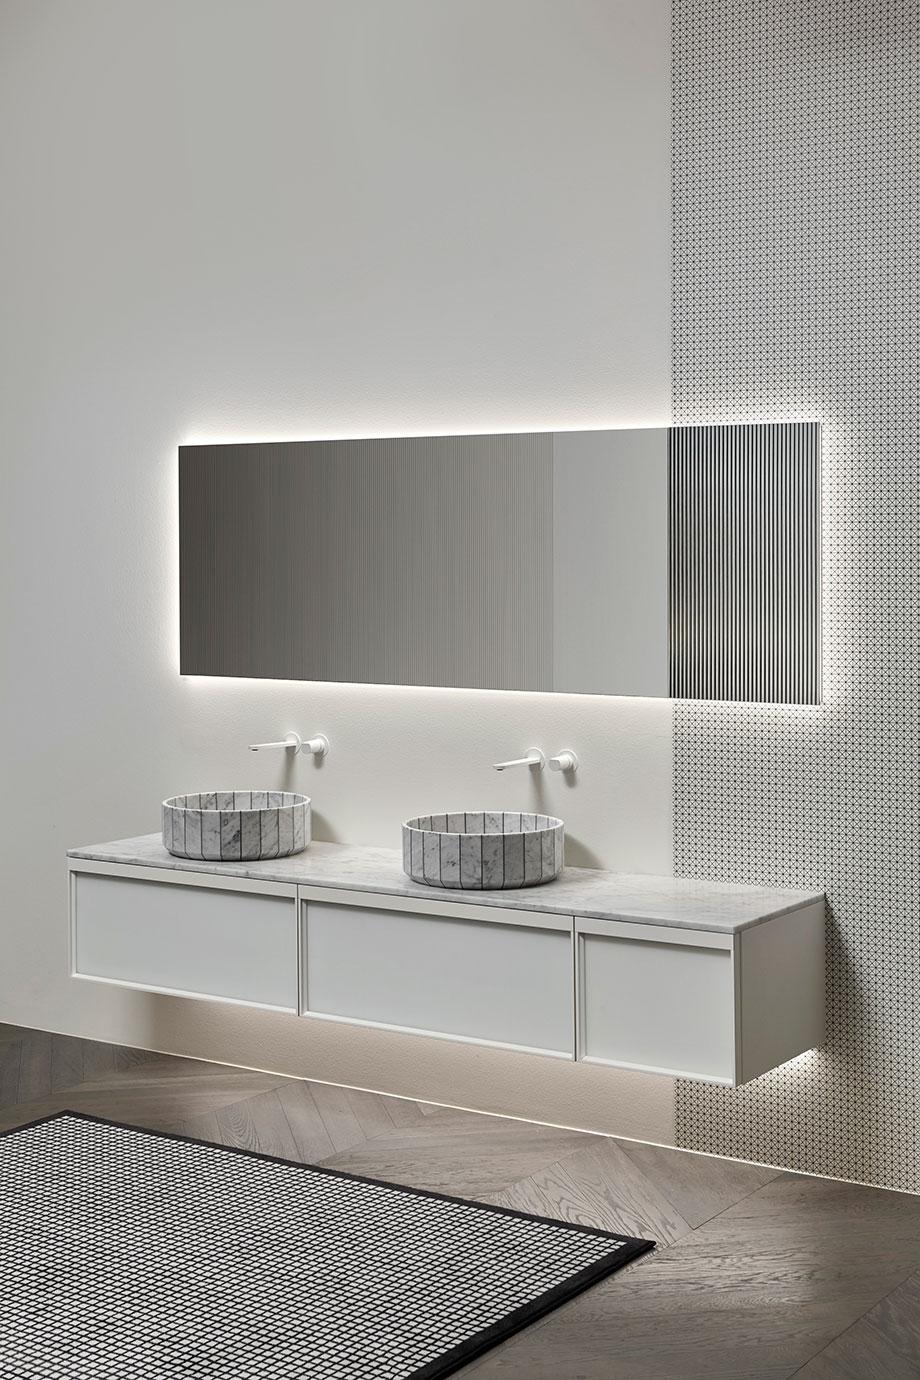 mobiliario baño bemade de carlo colombo para antoniolupi (6)